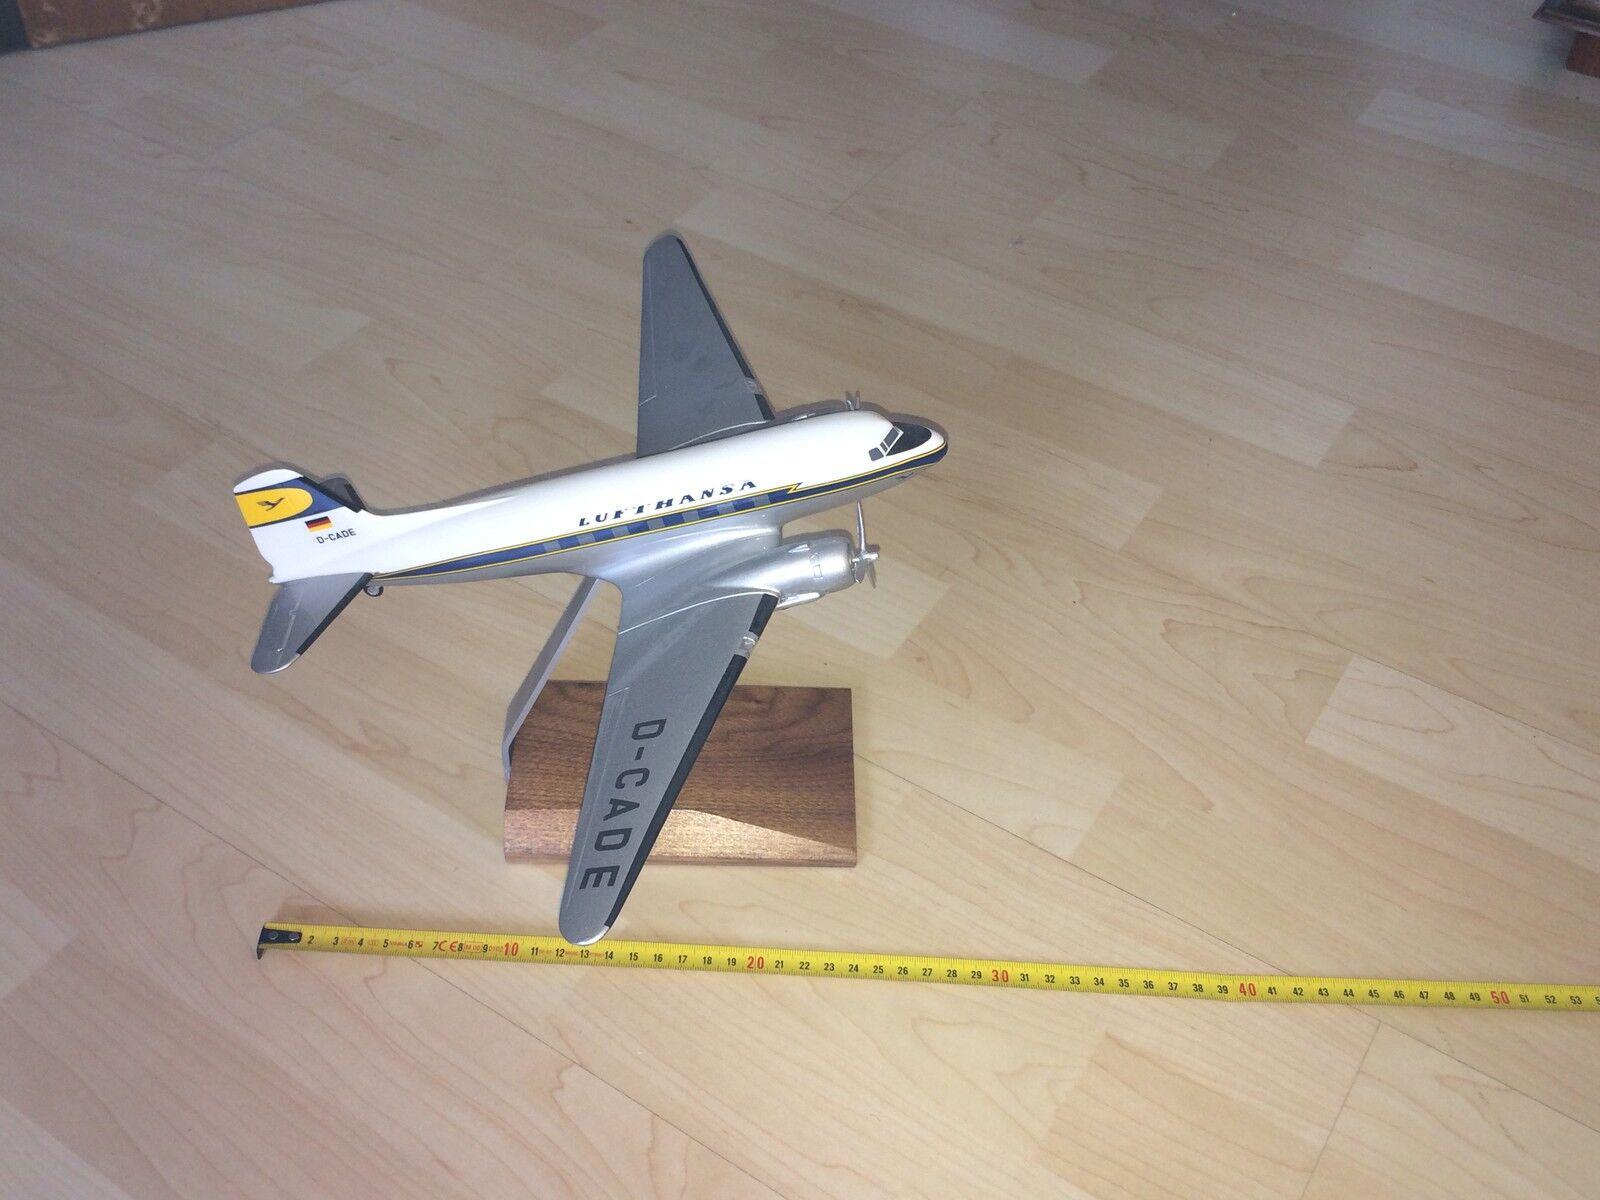 Lufthansa Lufthansa Lufthansa DC-3, 1 72,  Atlantic Models faa9e2